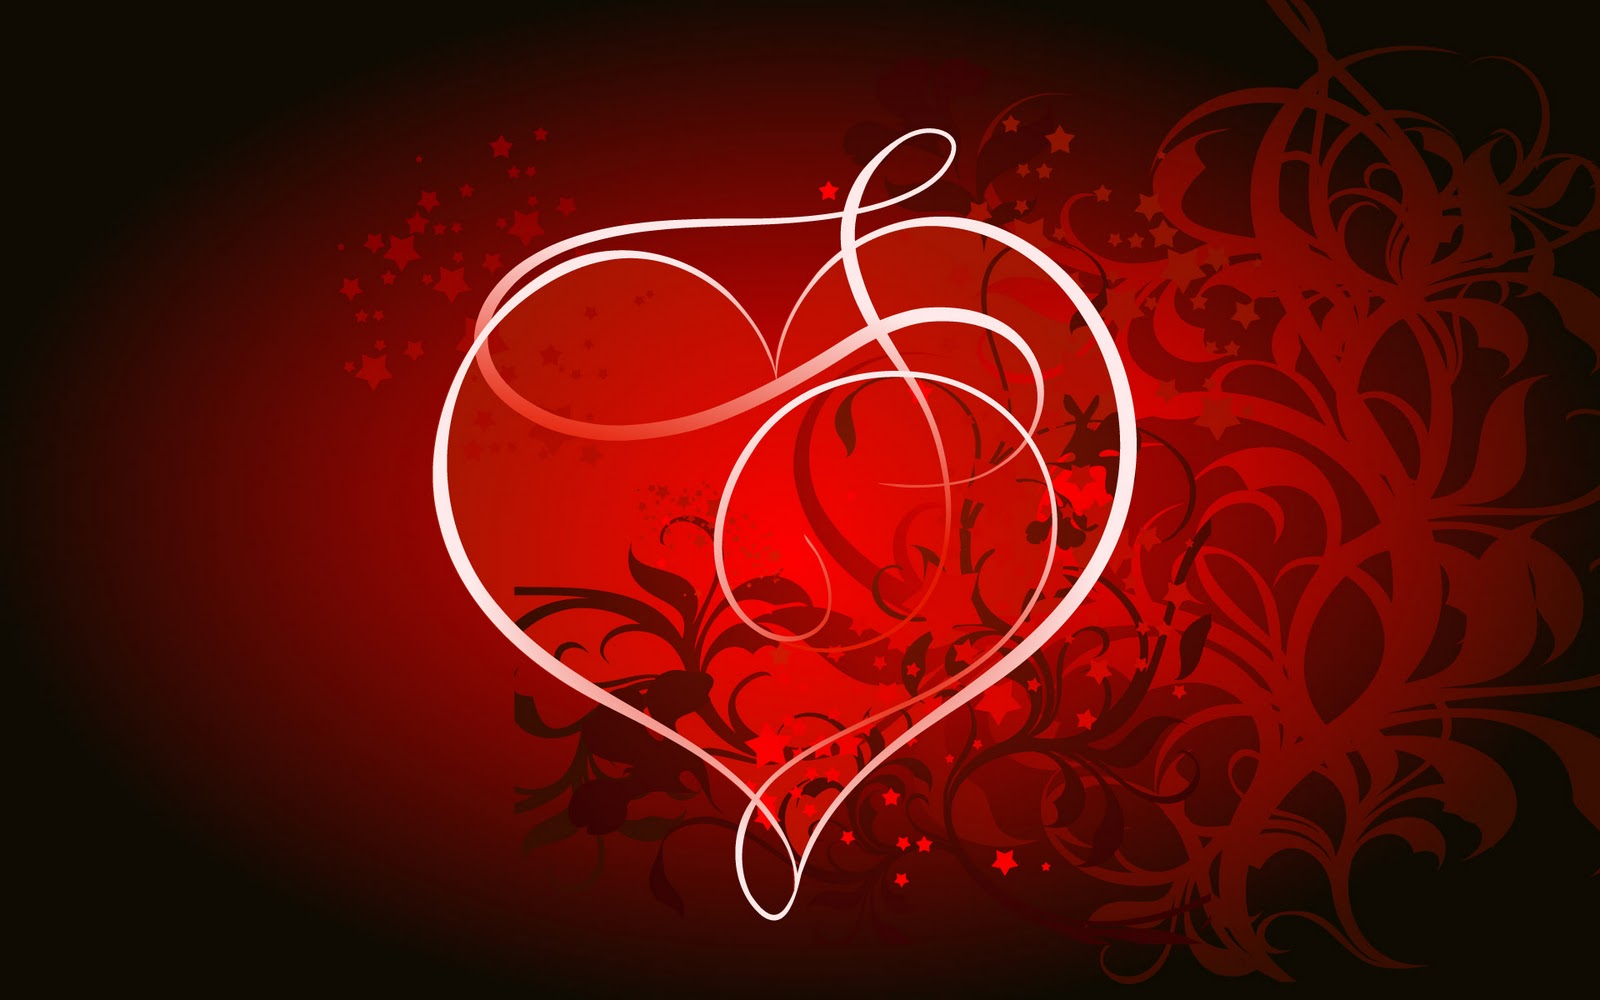 St Valentine Desktop red heart wallpaper freejpg 1600x1000